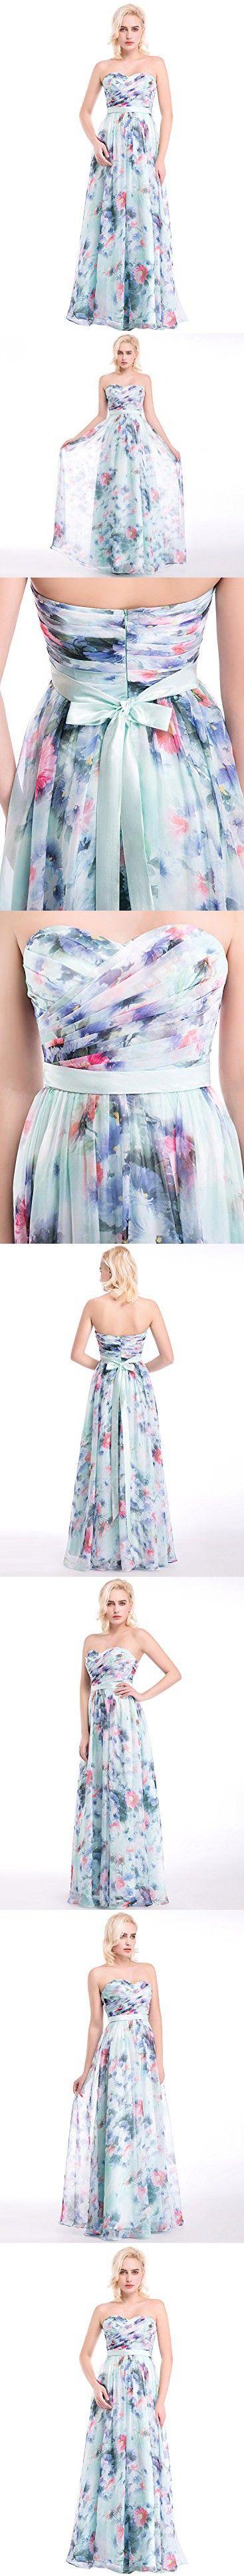 Azbro Women's Floral Print High Waist Corset Prom Dress, Multicolored XXL